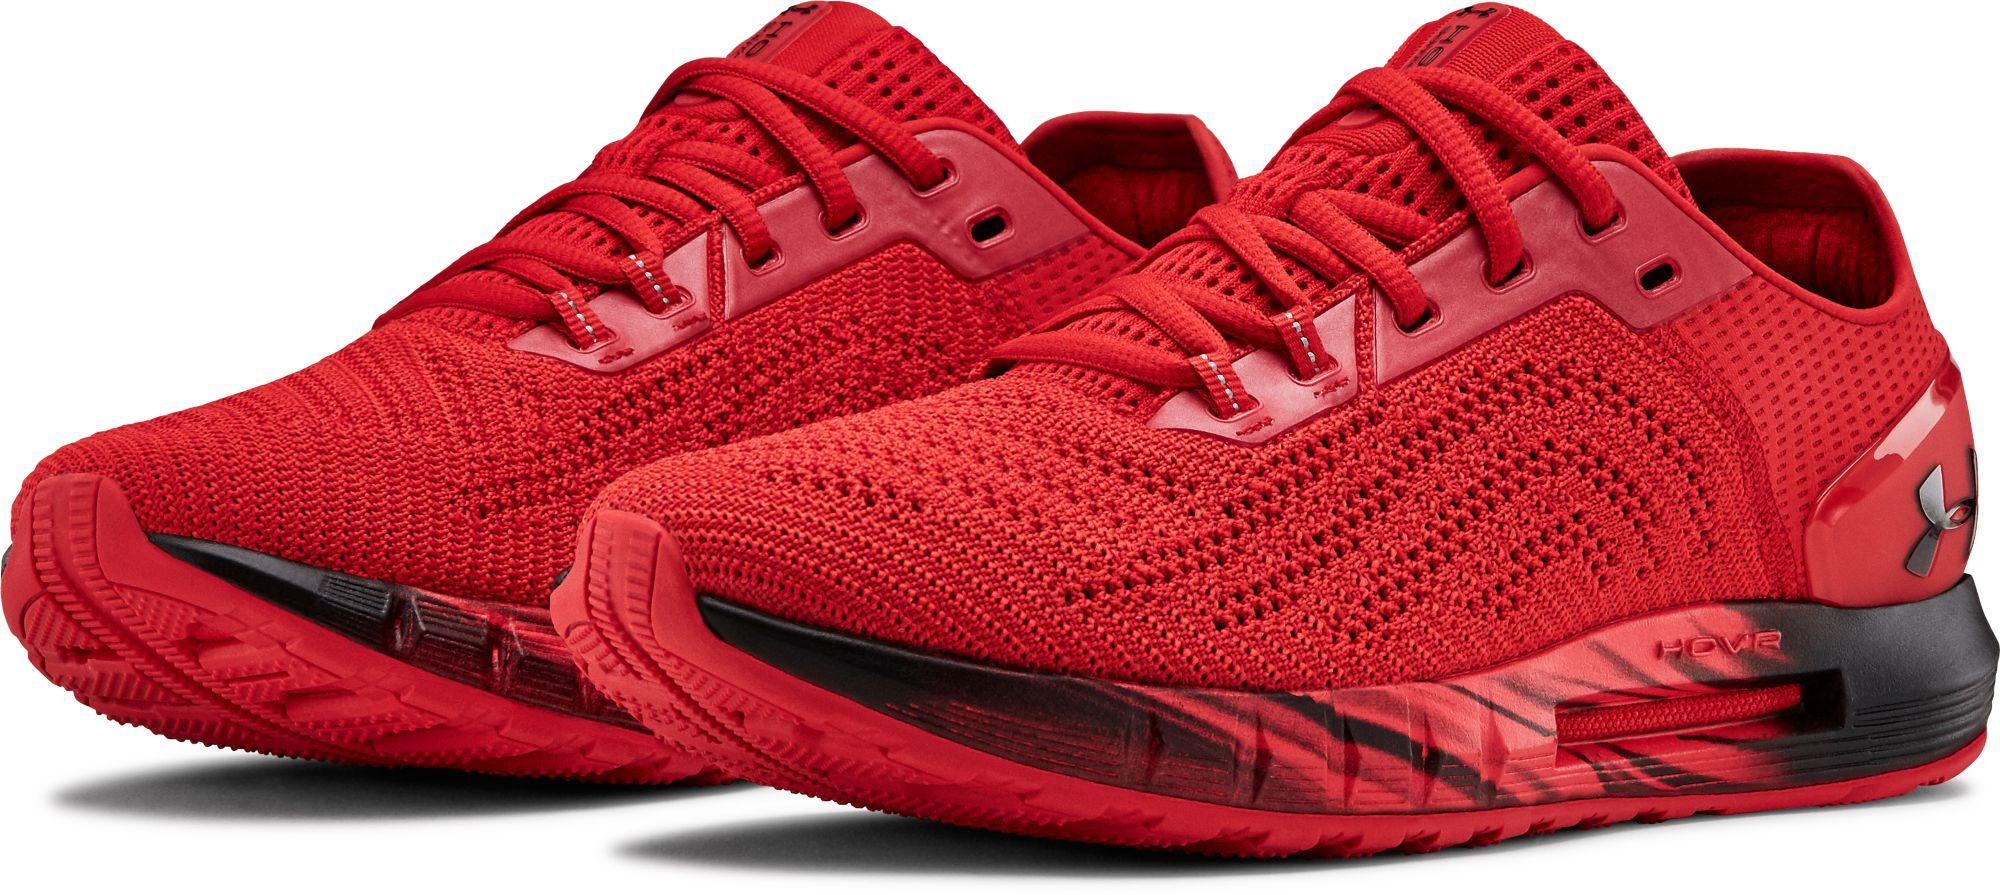 Hovr Sonic 2 Bnb Running Shoes